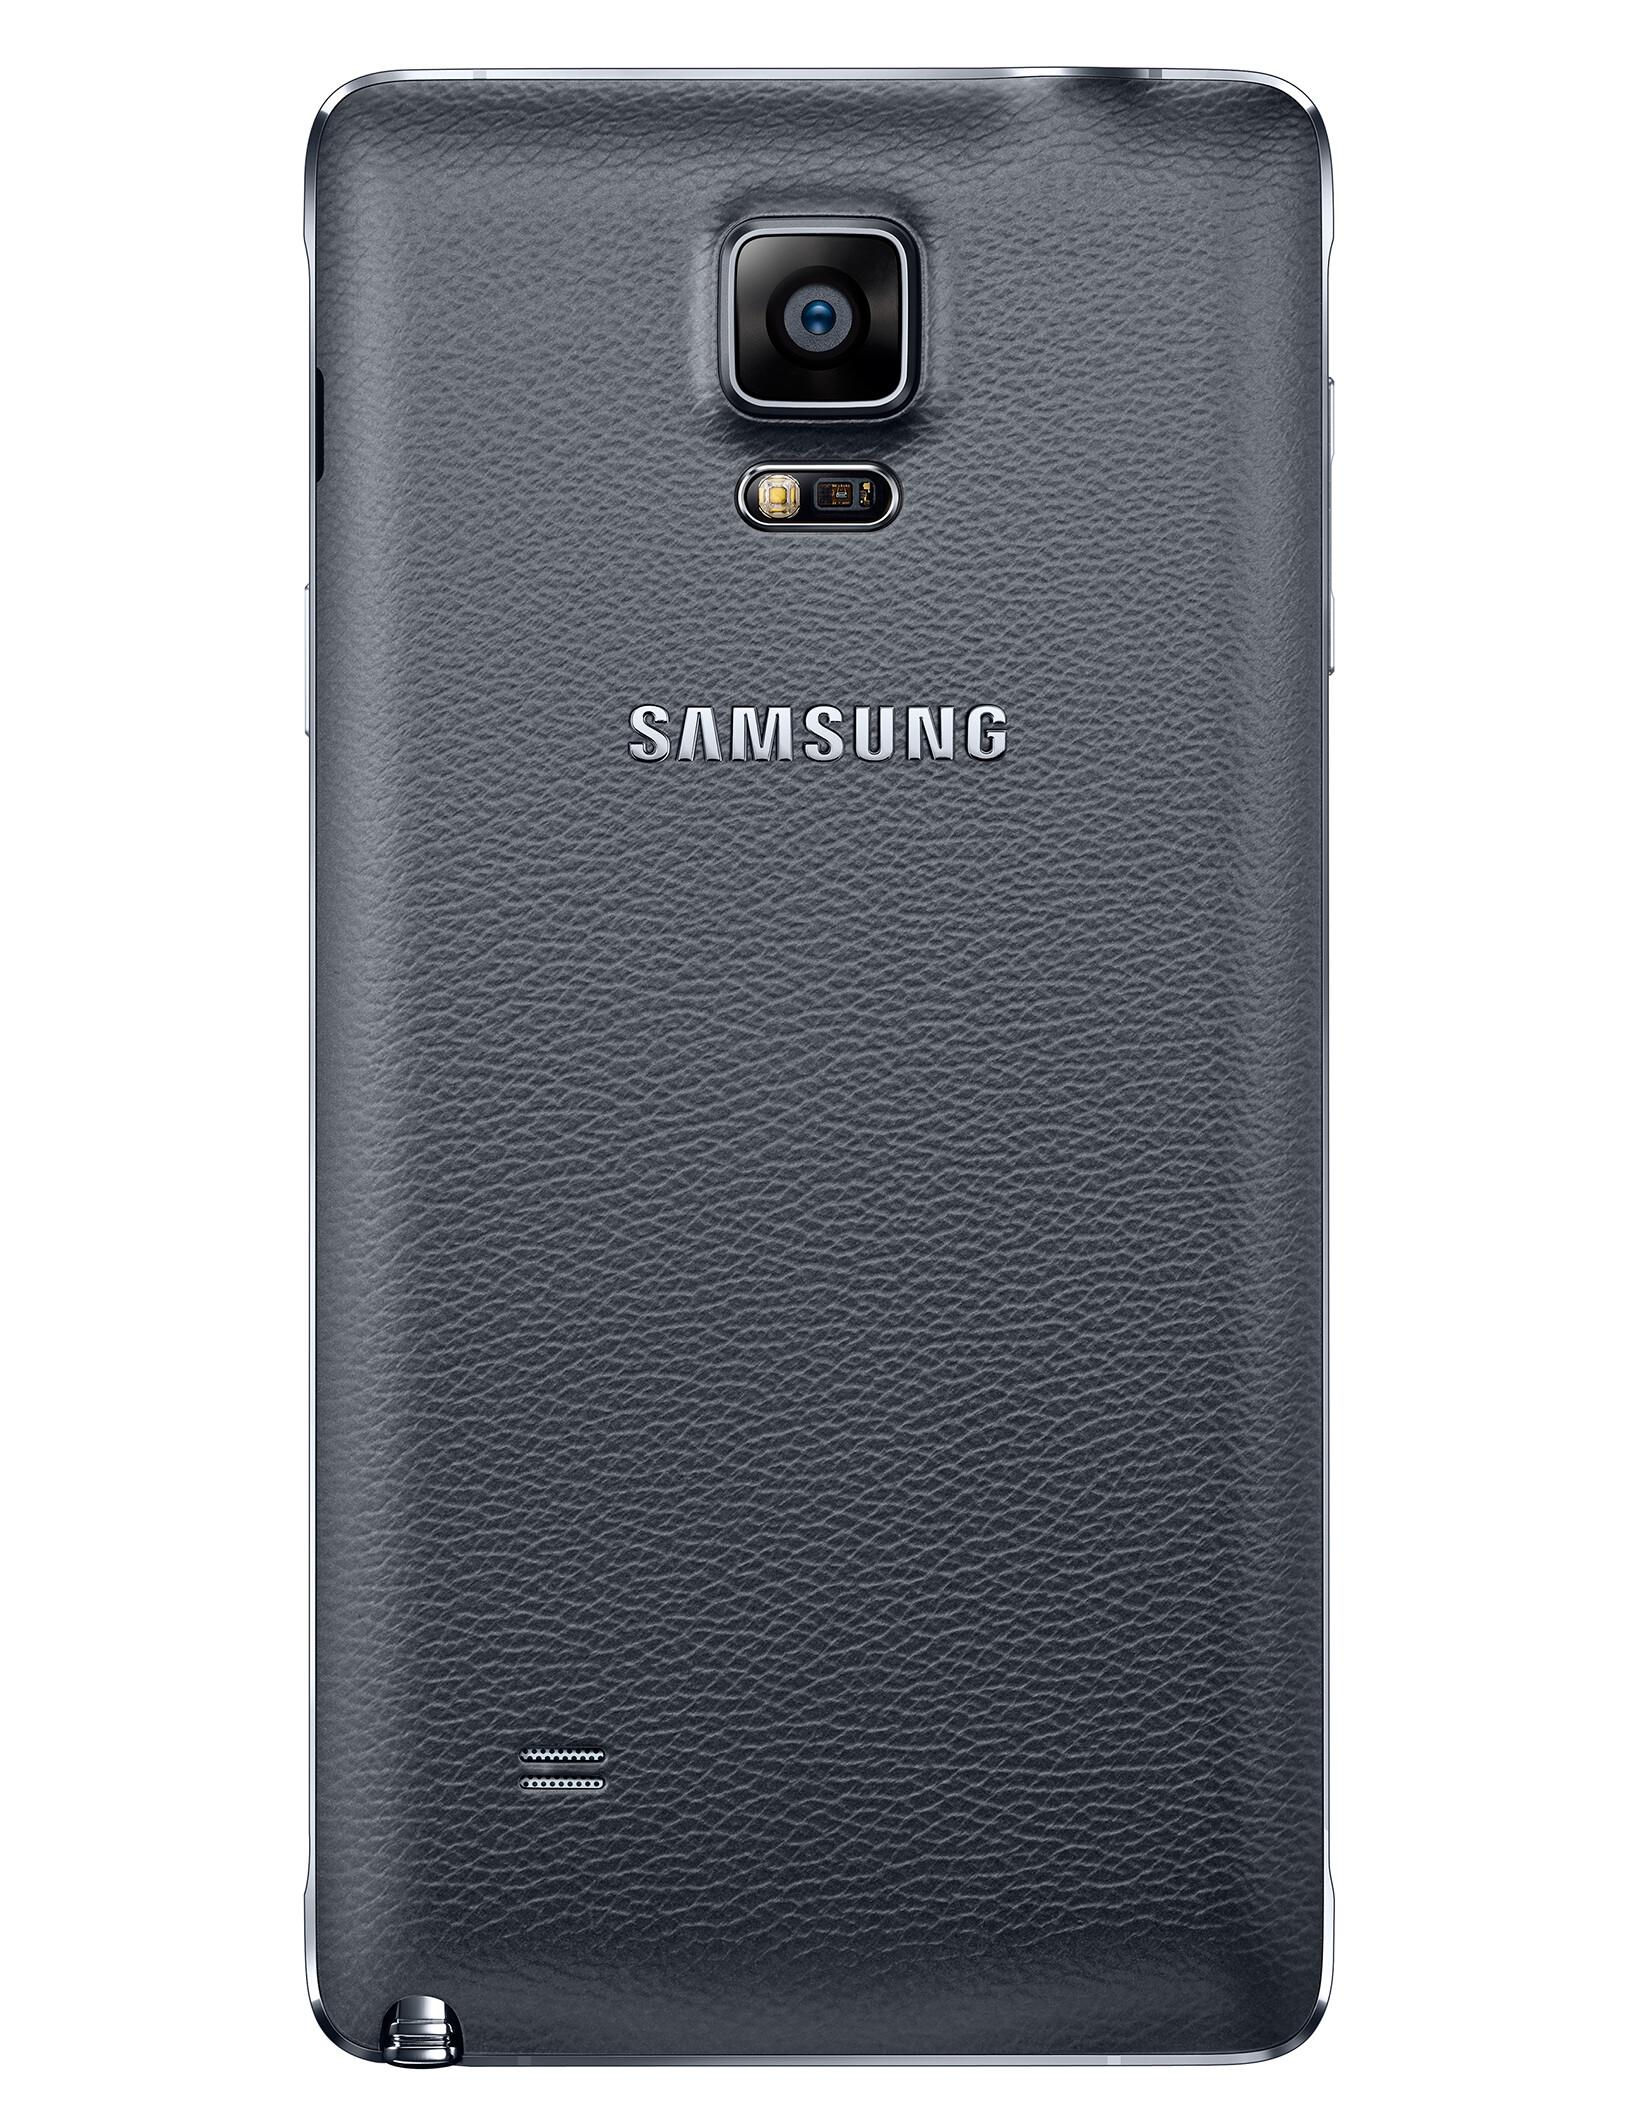 Samsung Galaxy Note 4 Specs Samsung Galaxy Note 4 View